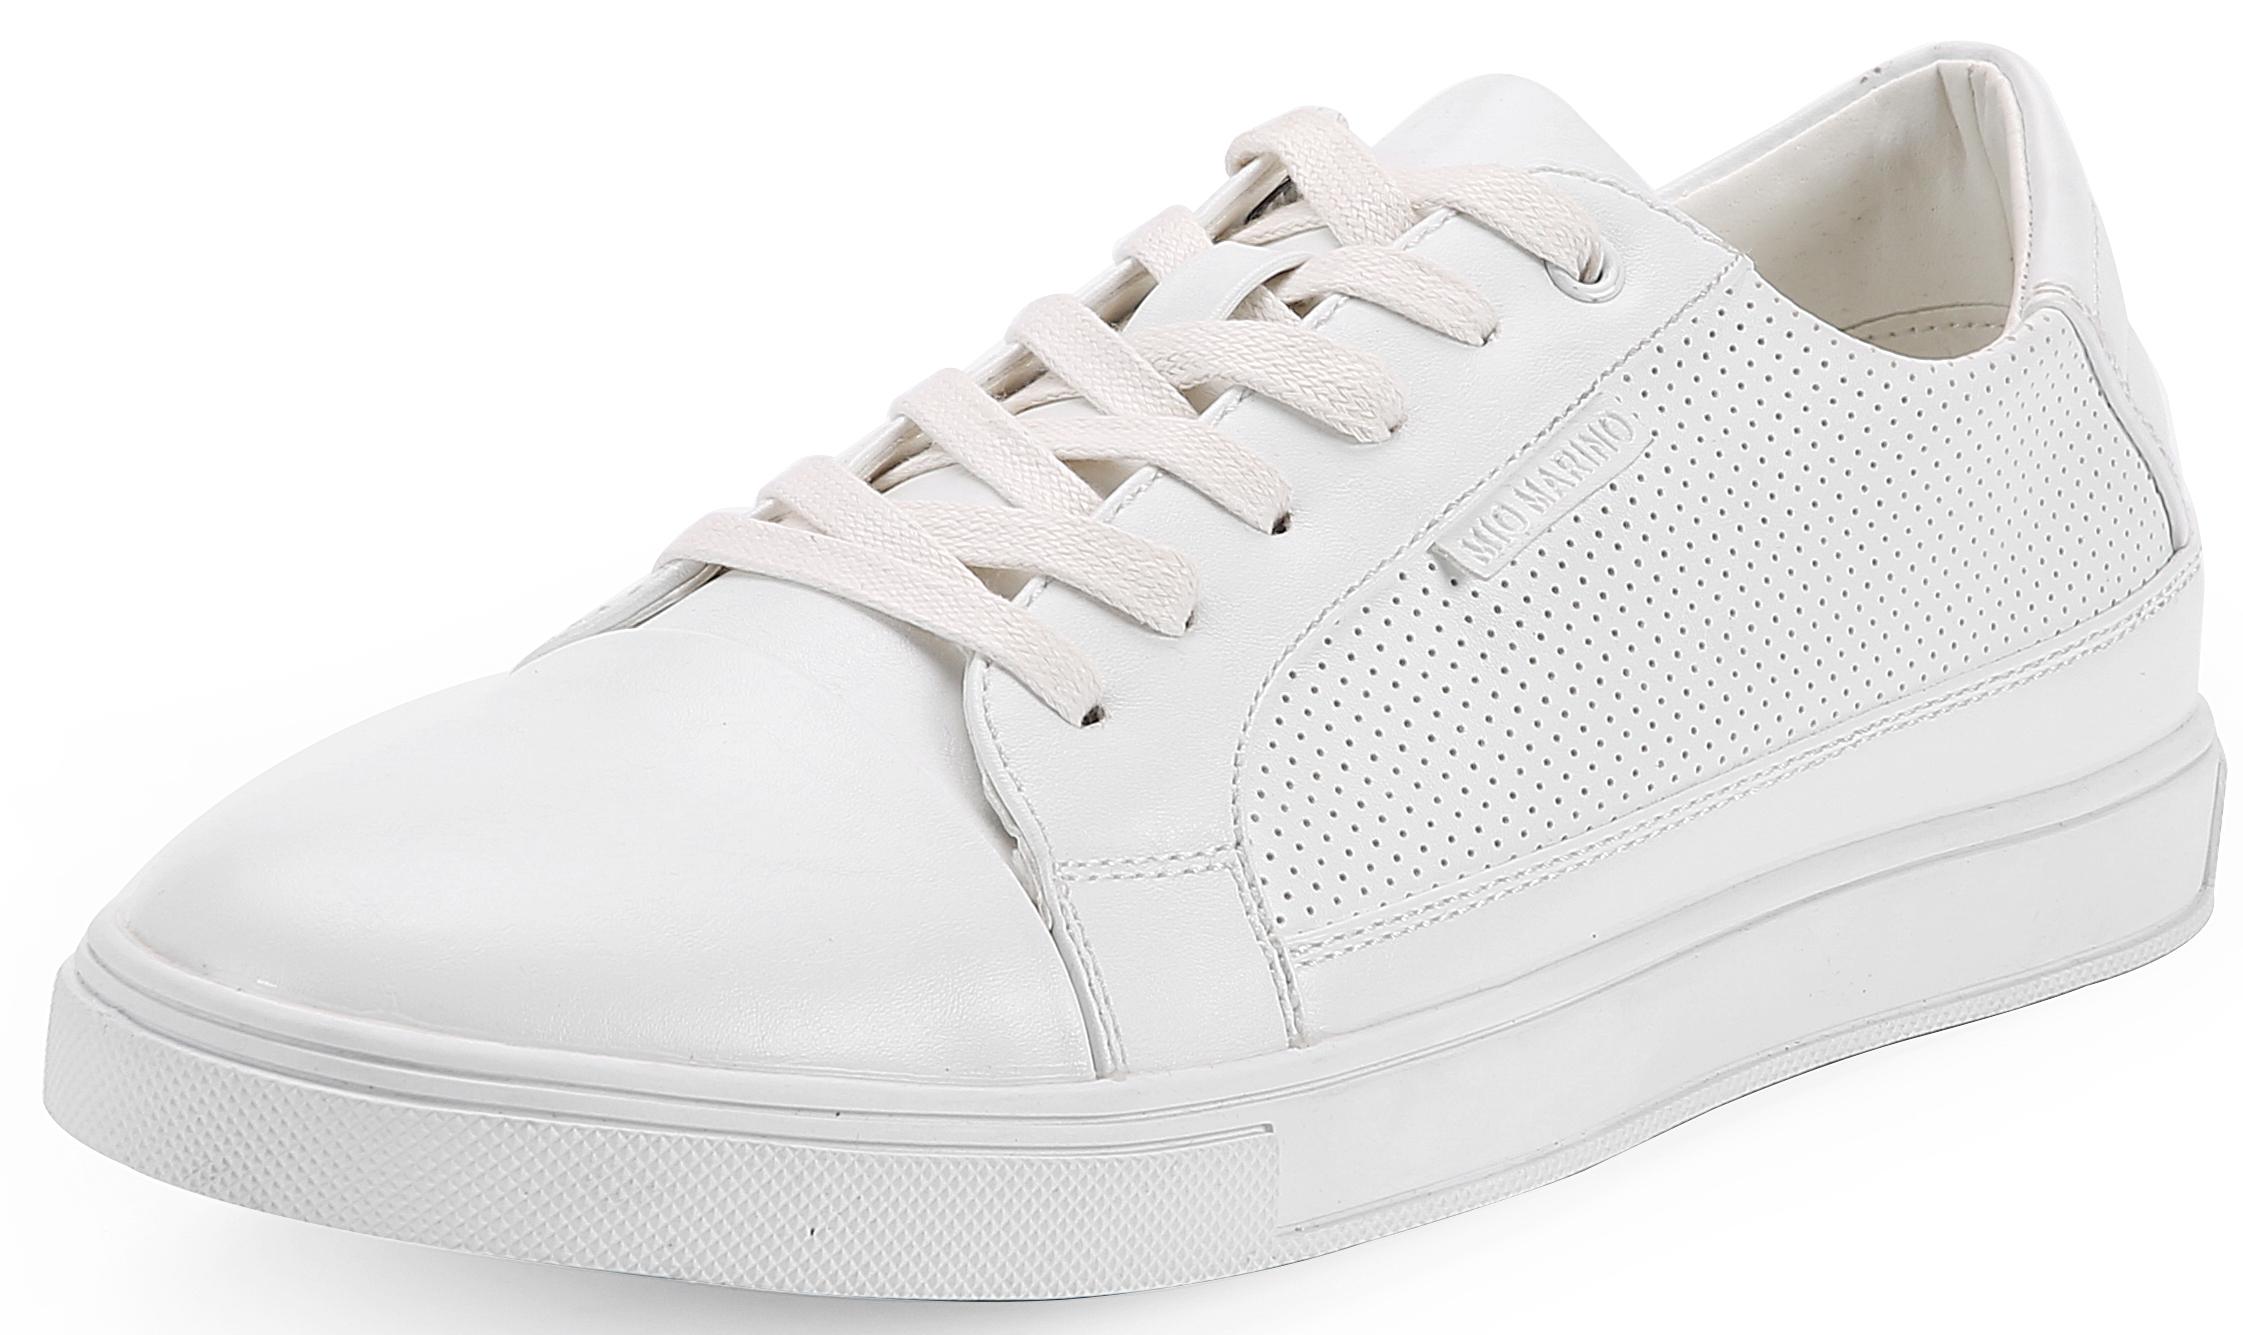 Dappled Lace Fashion Sneakers White | Trada Marketplace